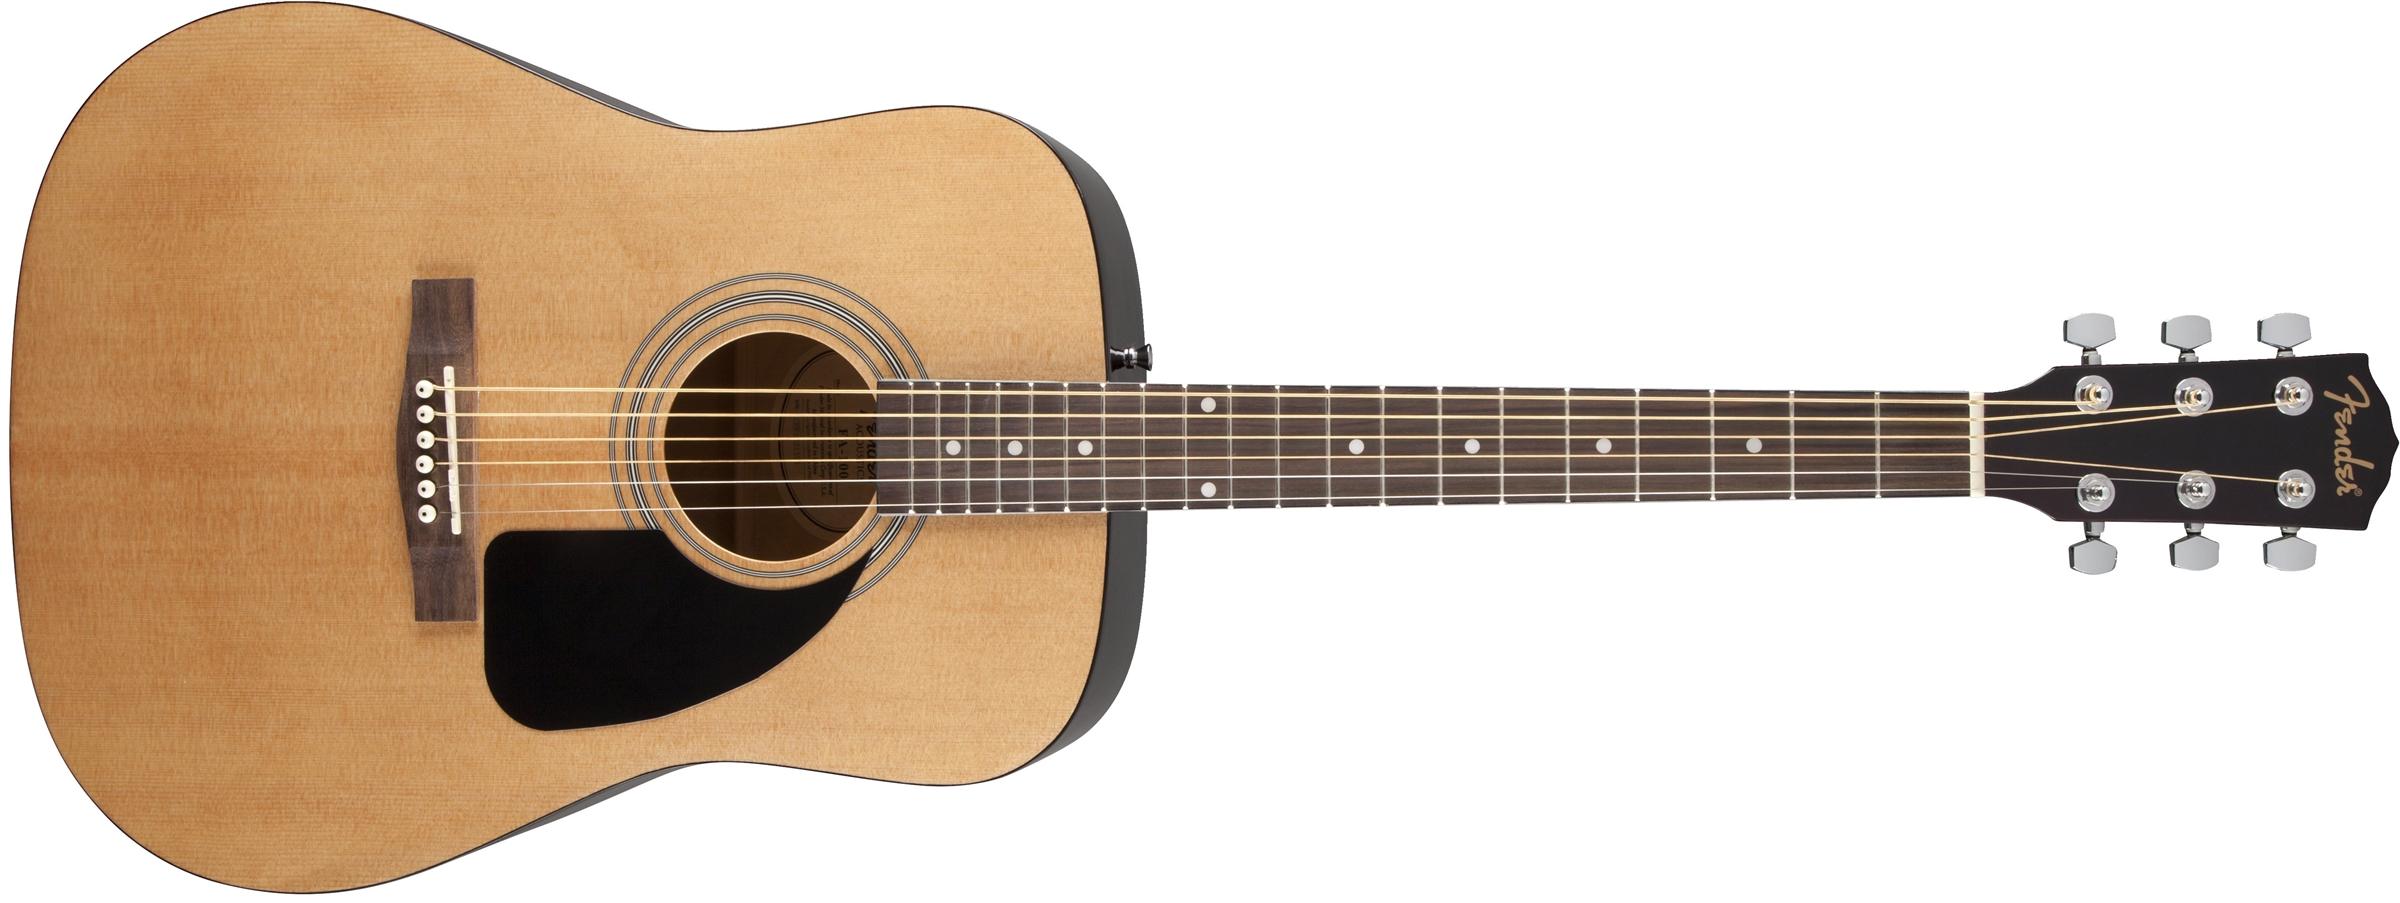 Fenderfa100 vs yamaha fg800 guitarras para principiantes